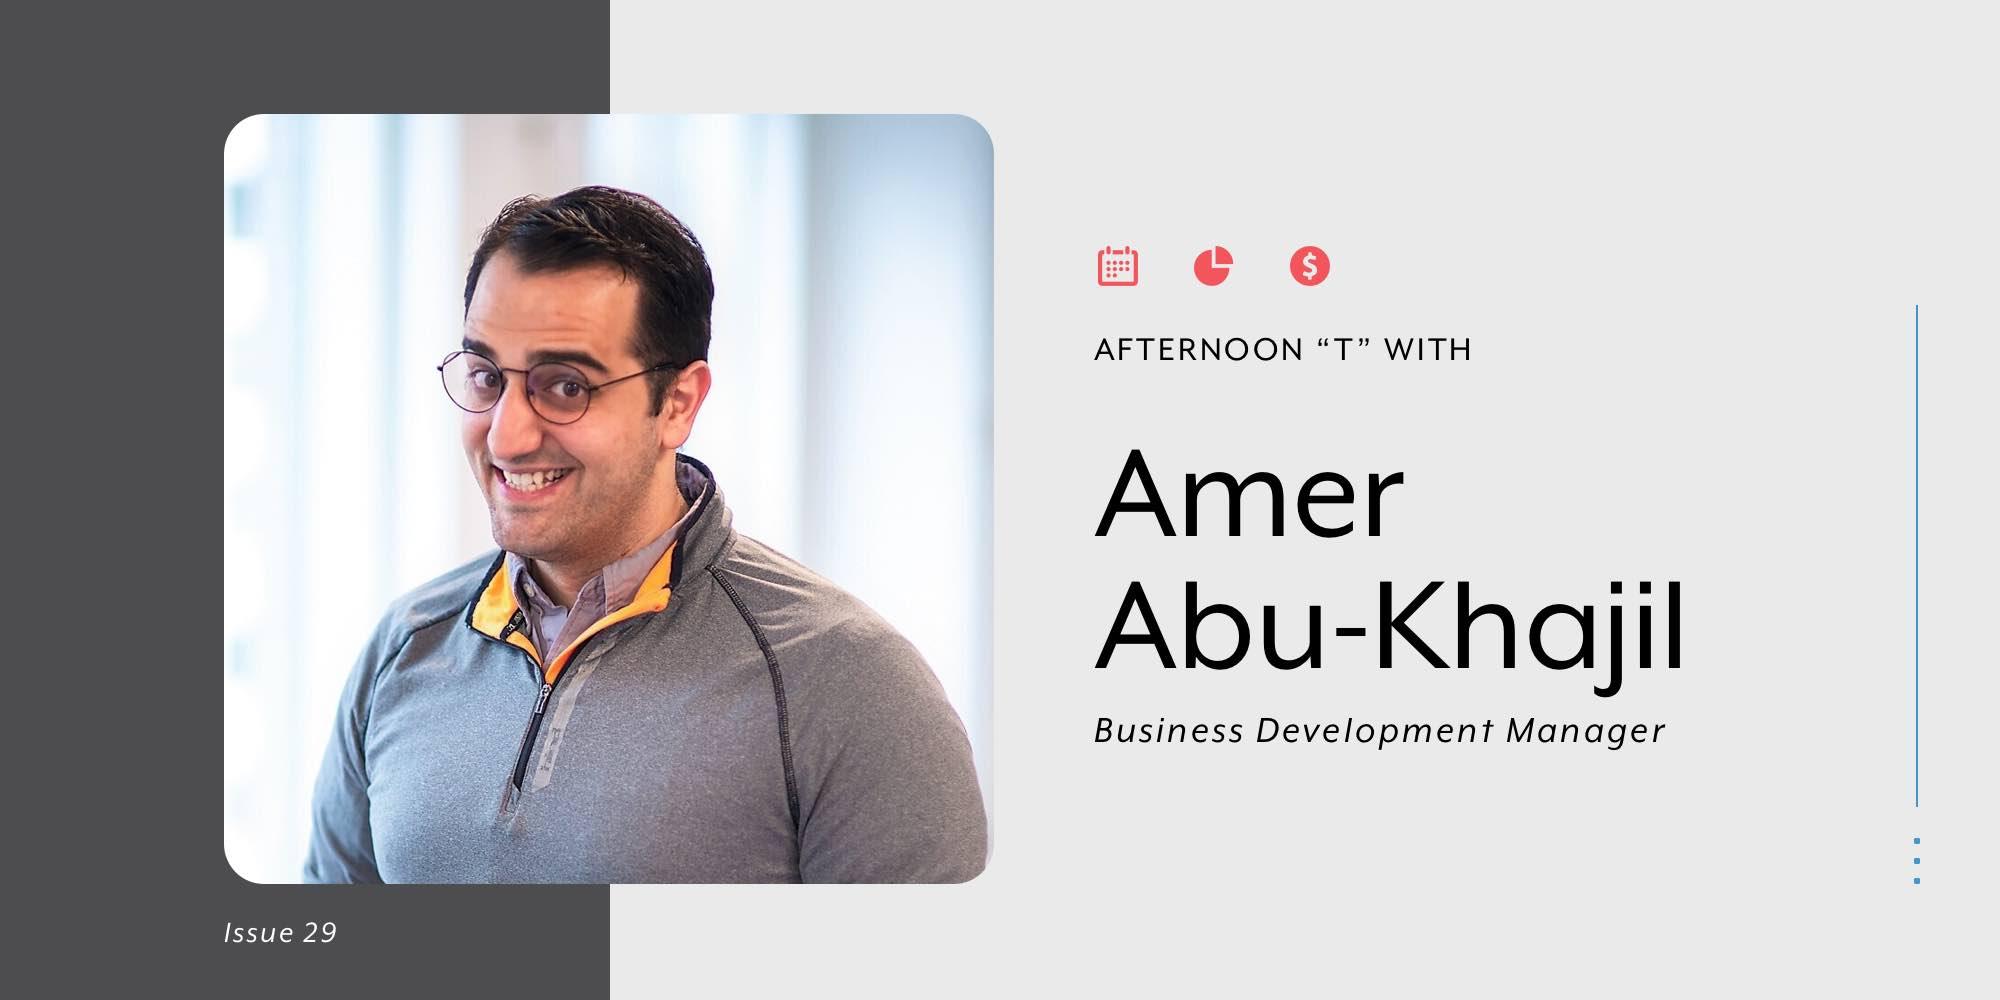 Business Development Manager Amer